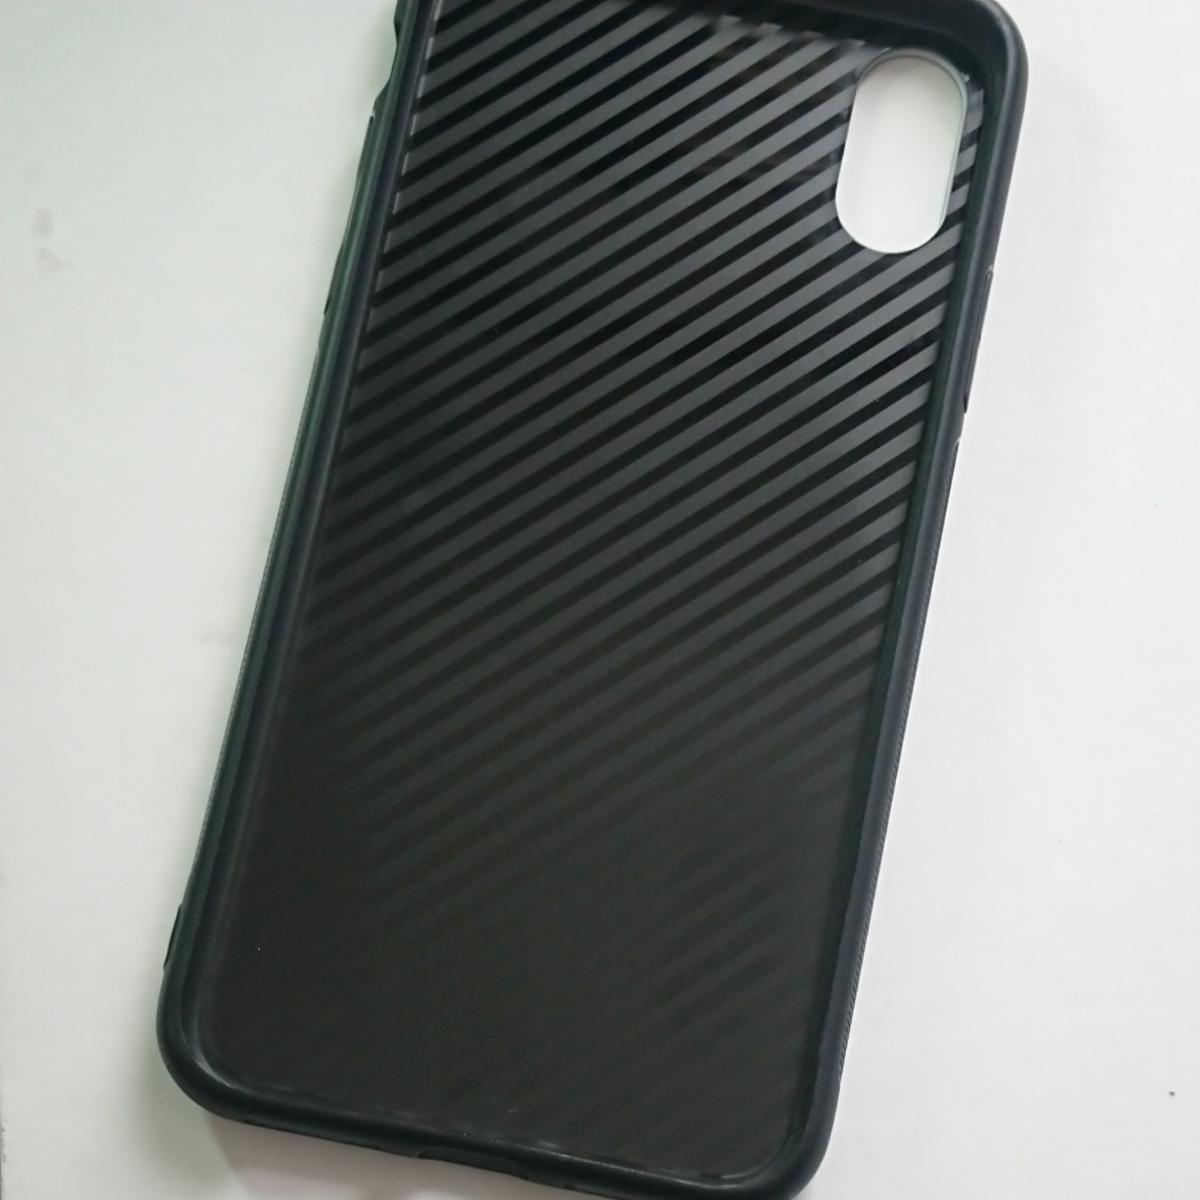 191c5fa5b7 ベヨネッタ2 BAYONETTA iPhoneケースアイフォンケースTPU樹脂素材強化ガラス高品質光沢iPhone X XS対応